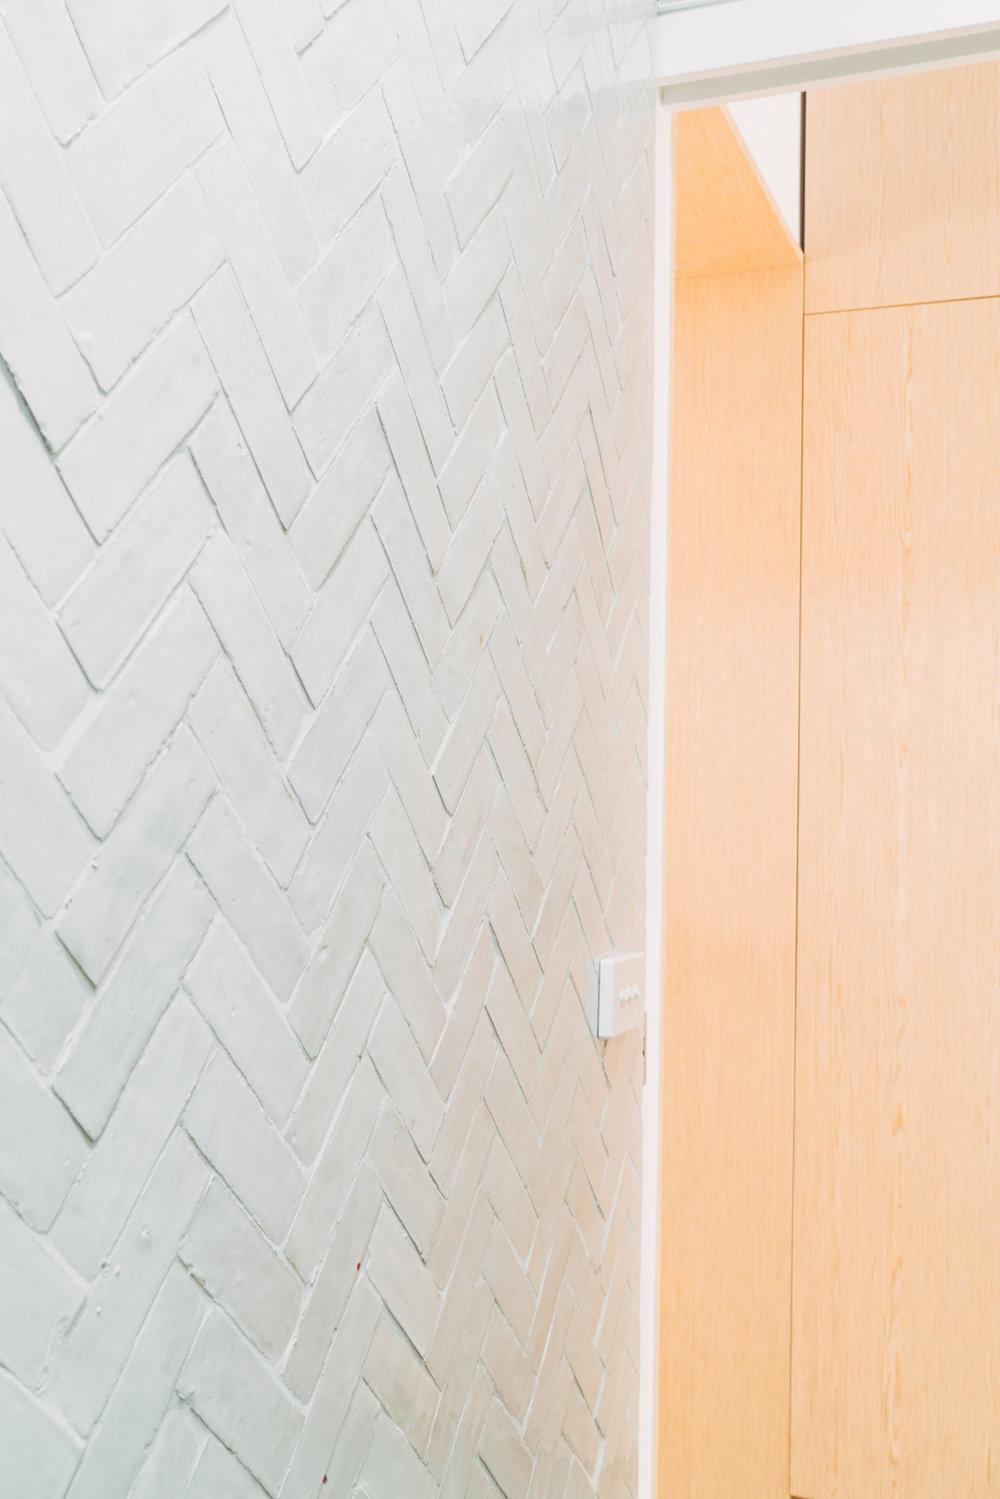 Tilesofezra BEJMAT Igloo feature wall moroccan tile .jpg